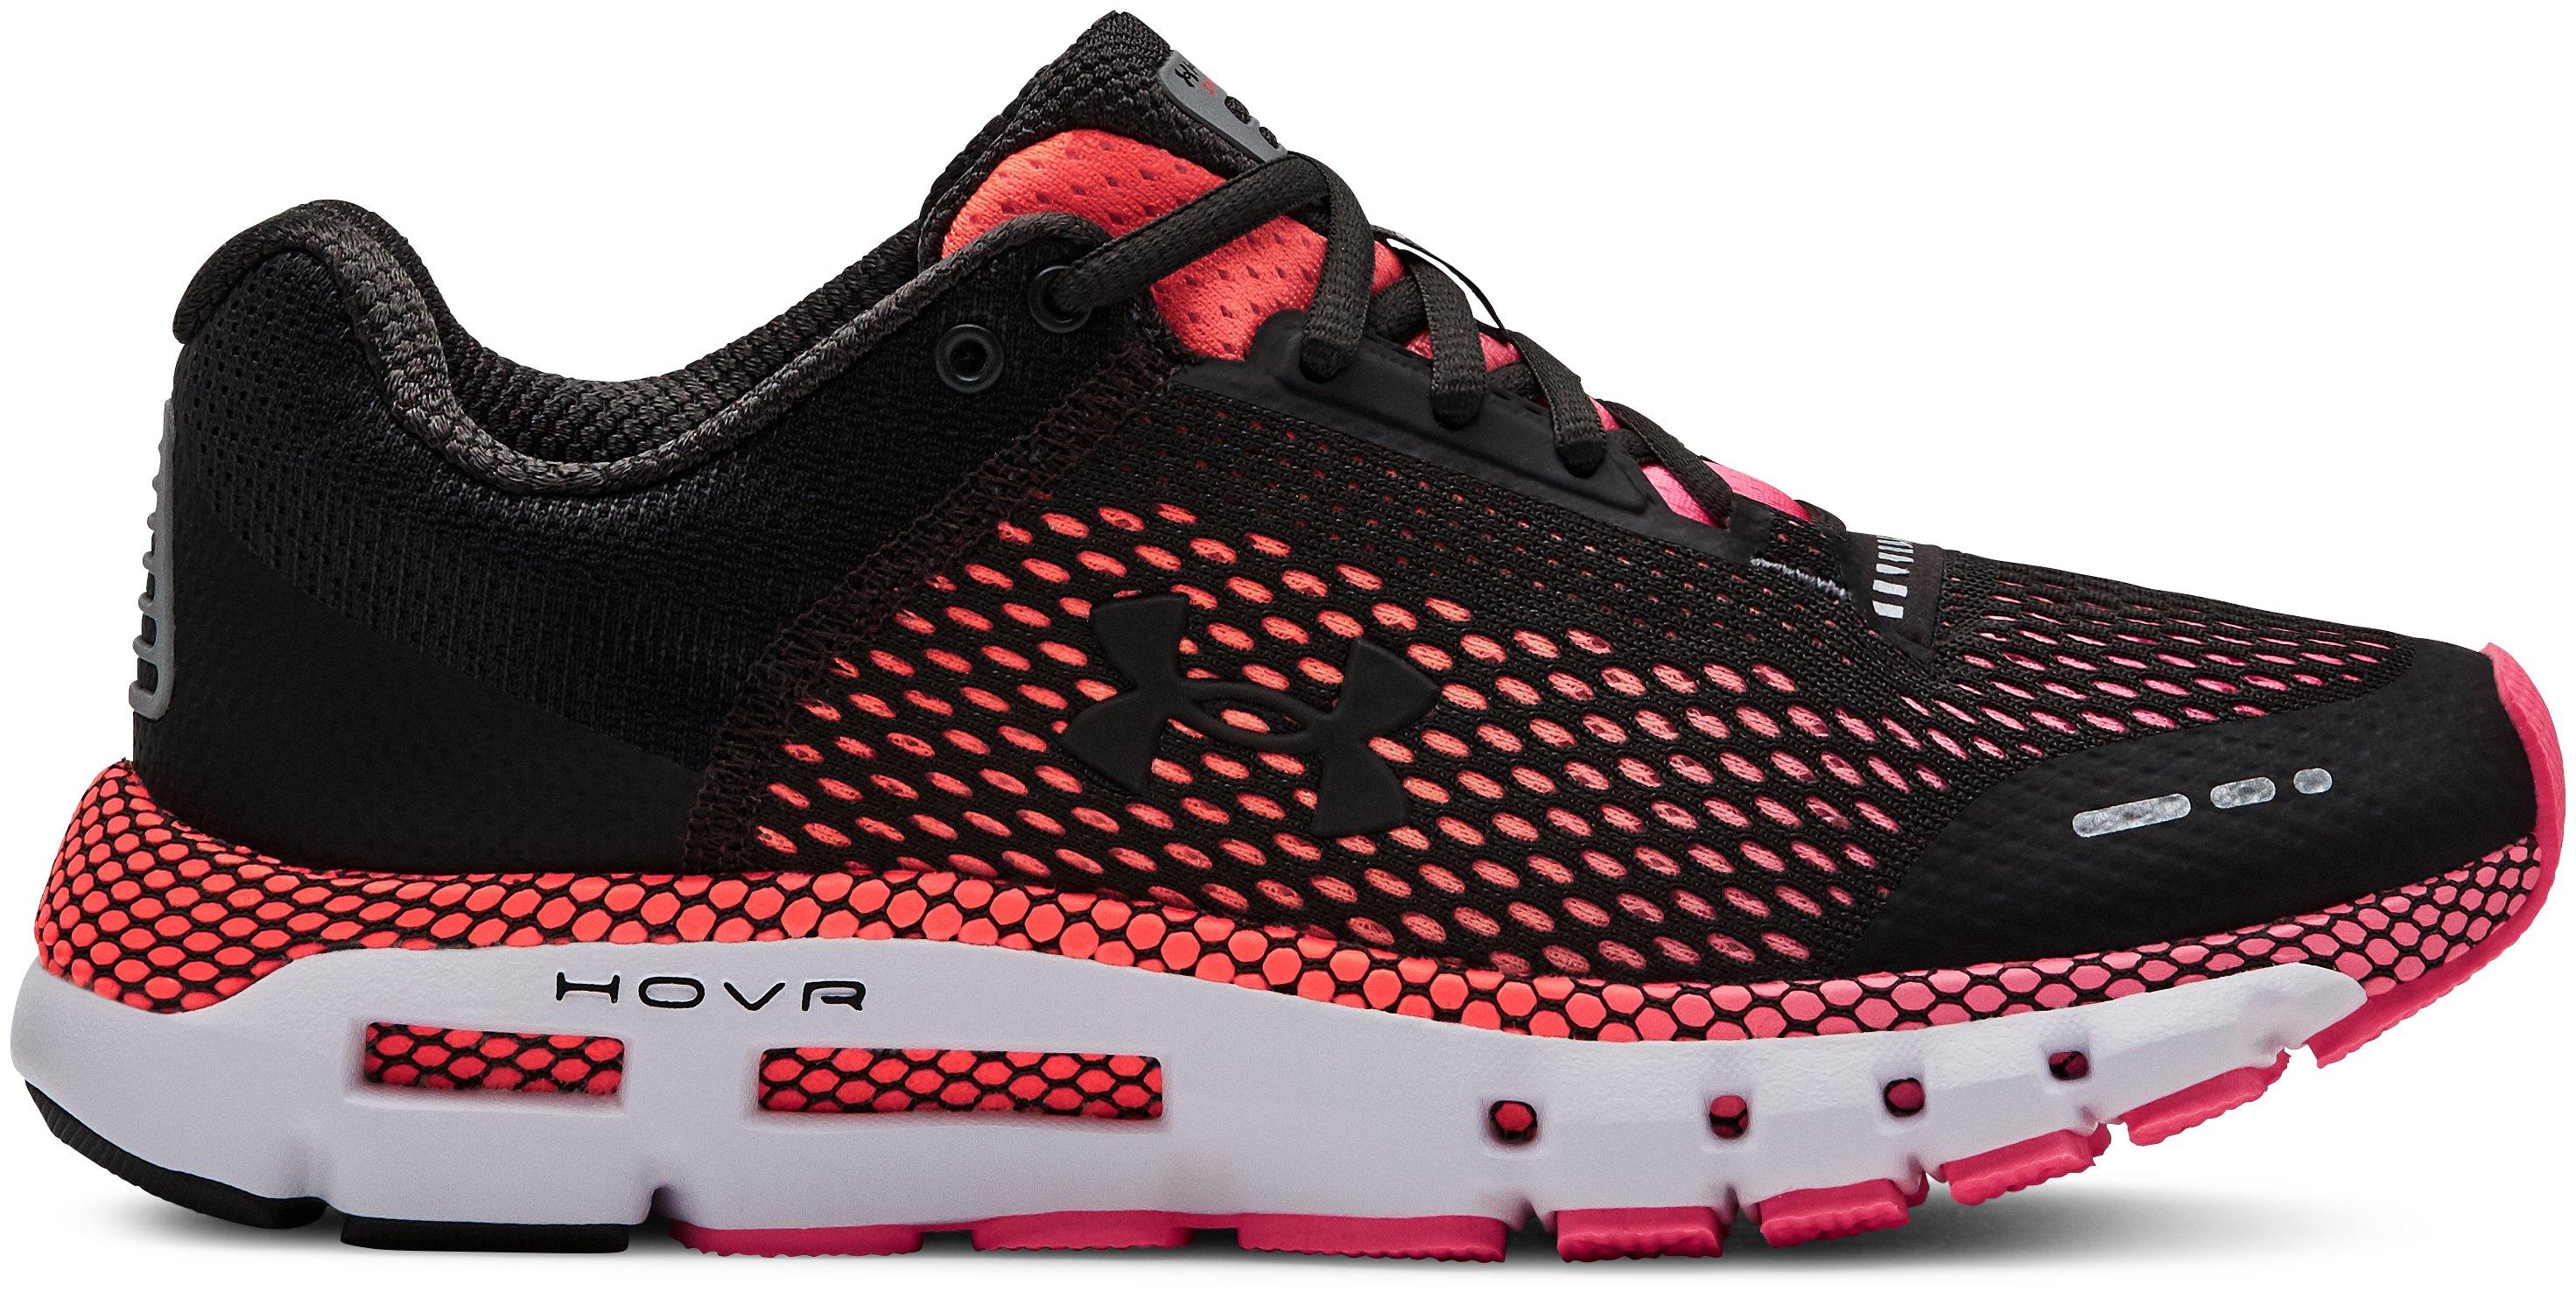 Zapatillas de running UA HOVR™ Infinite para mujer, 360 degree view